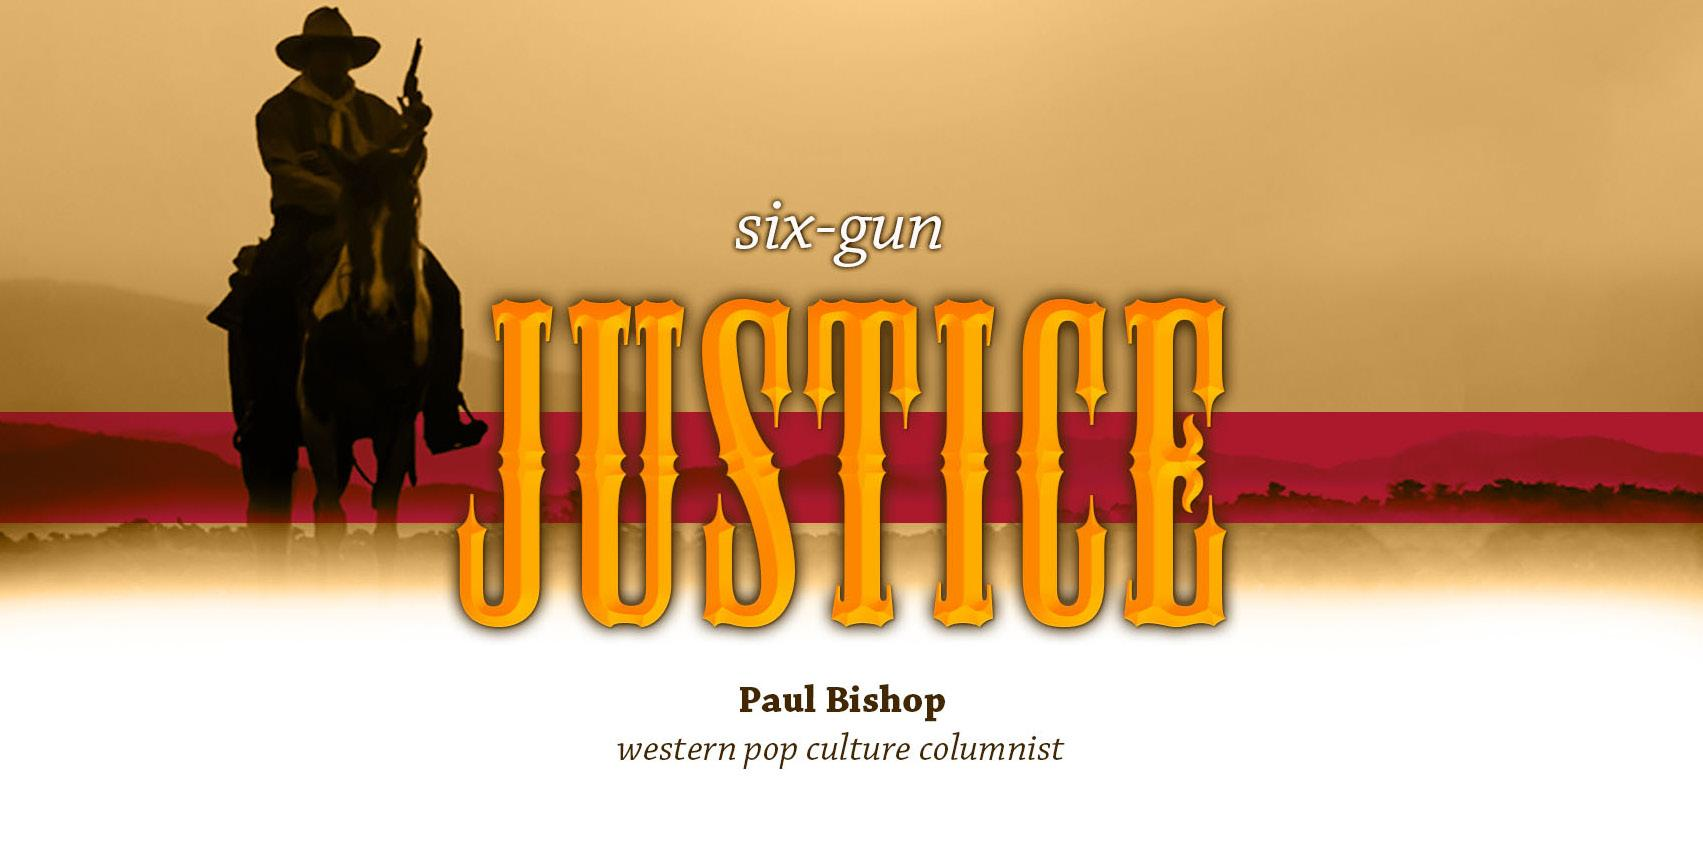 Page 8 of Six-Gun Justice by Western Pop Culture Columnist Paul Bishop